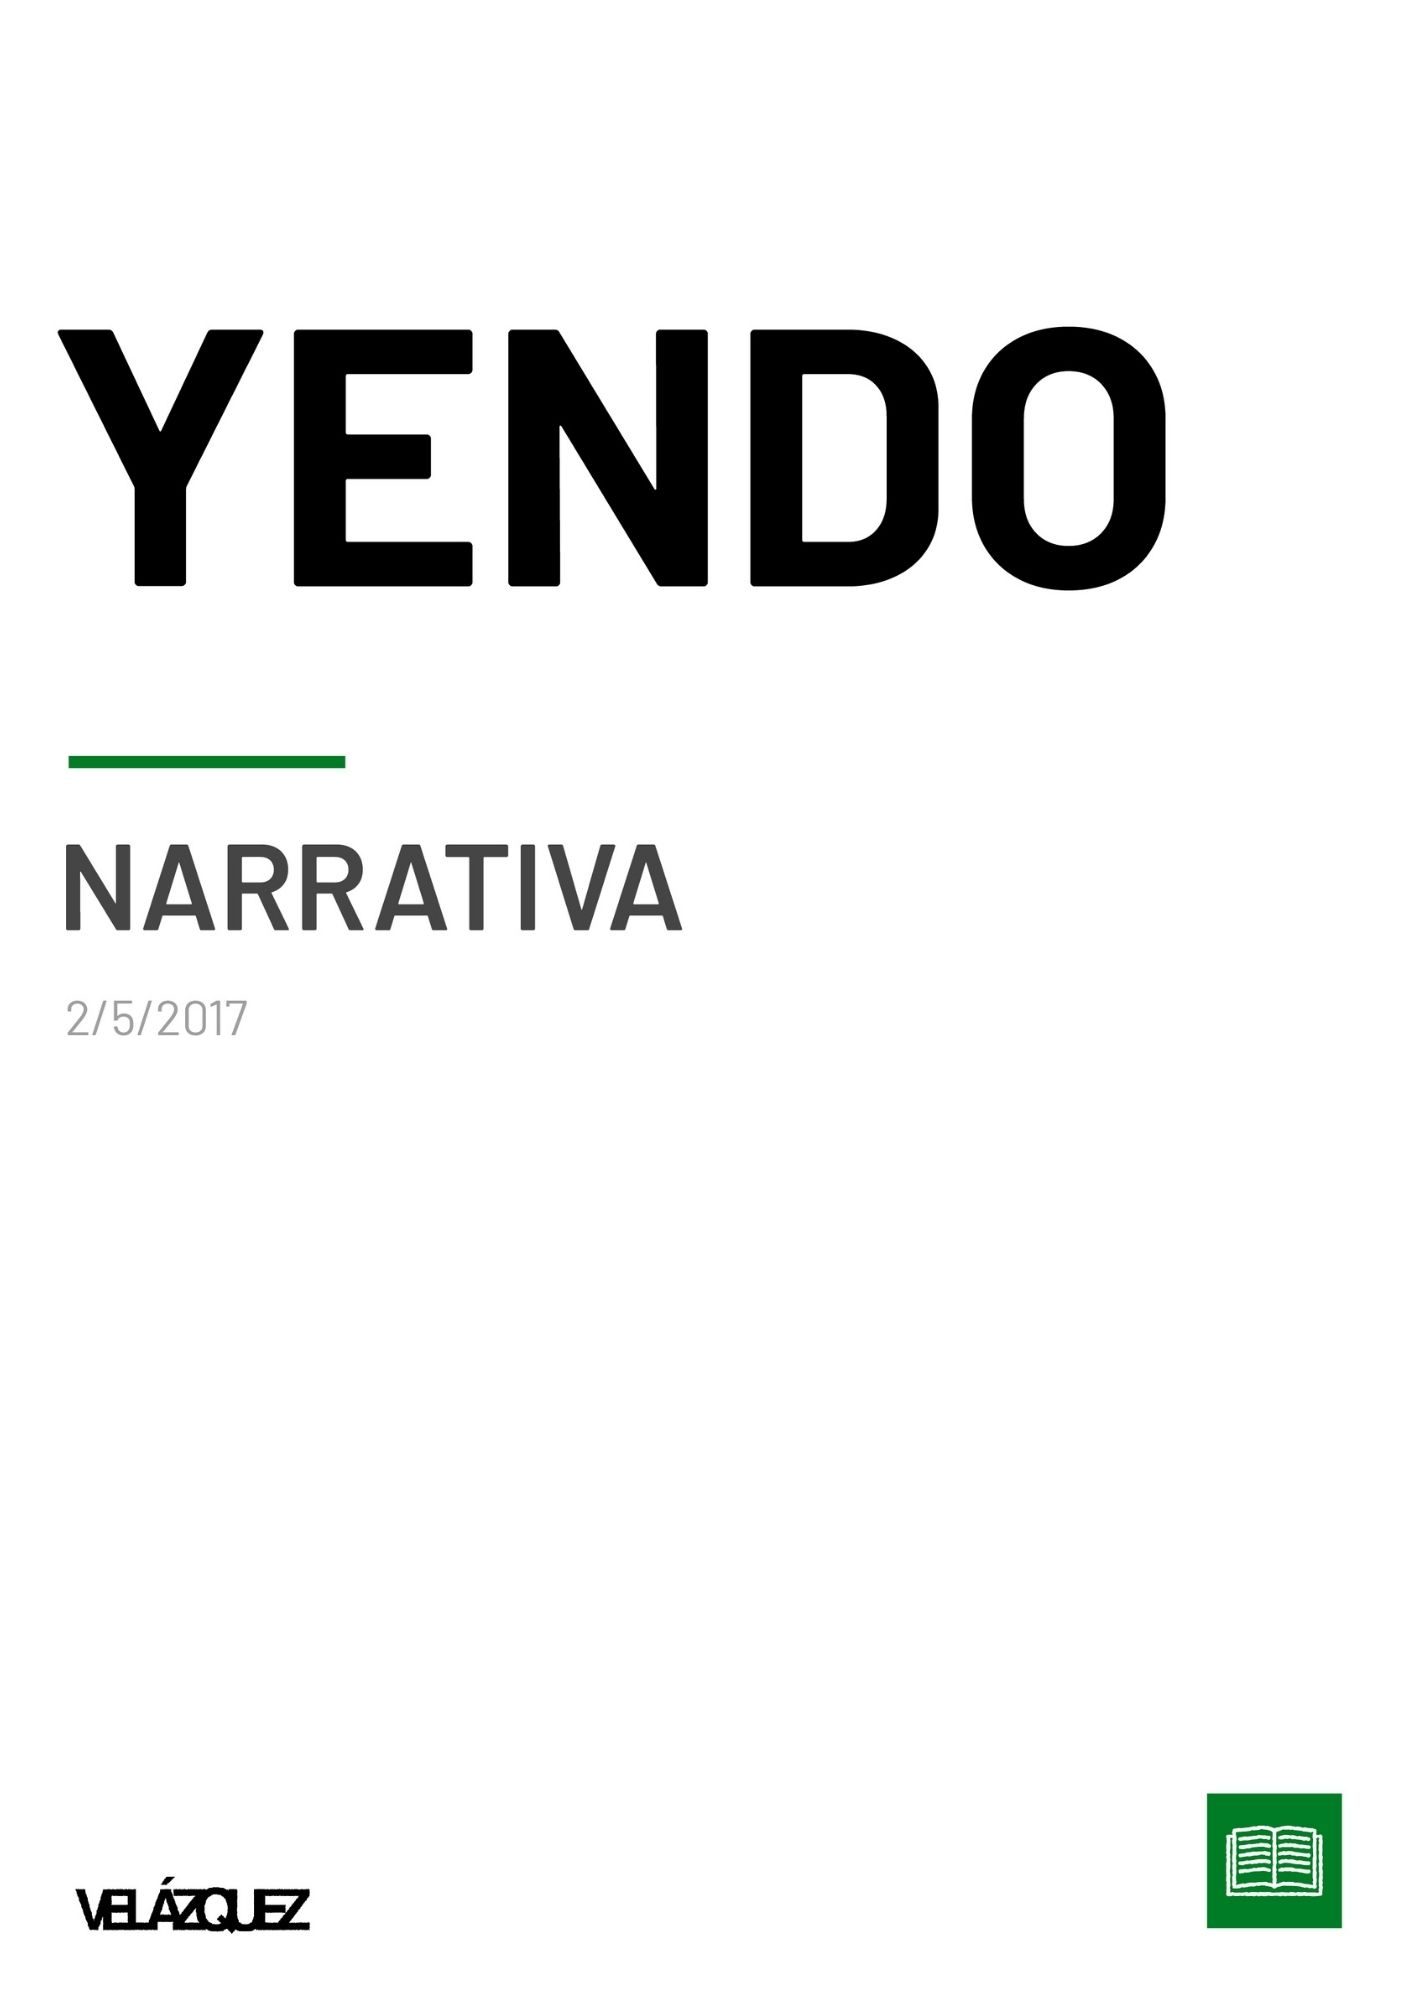 Yendo - Narrativa - Fabri Velázquez